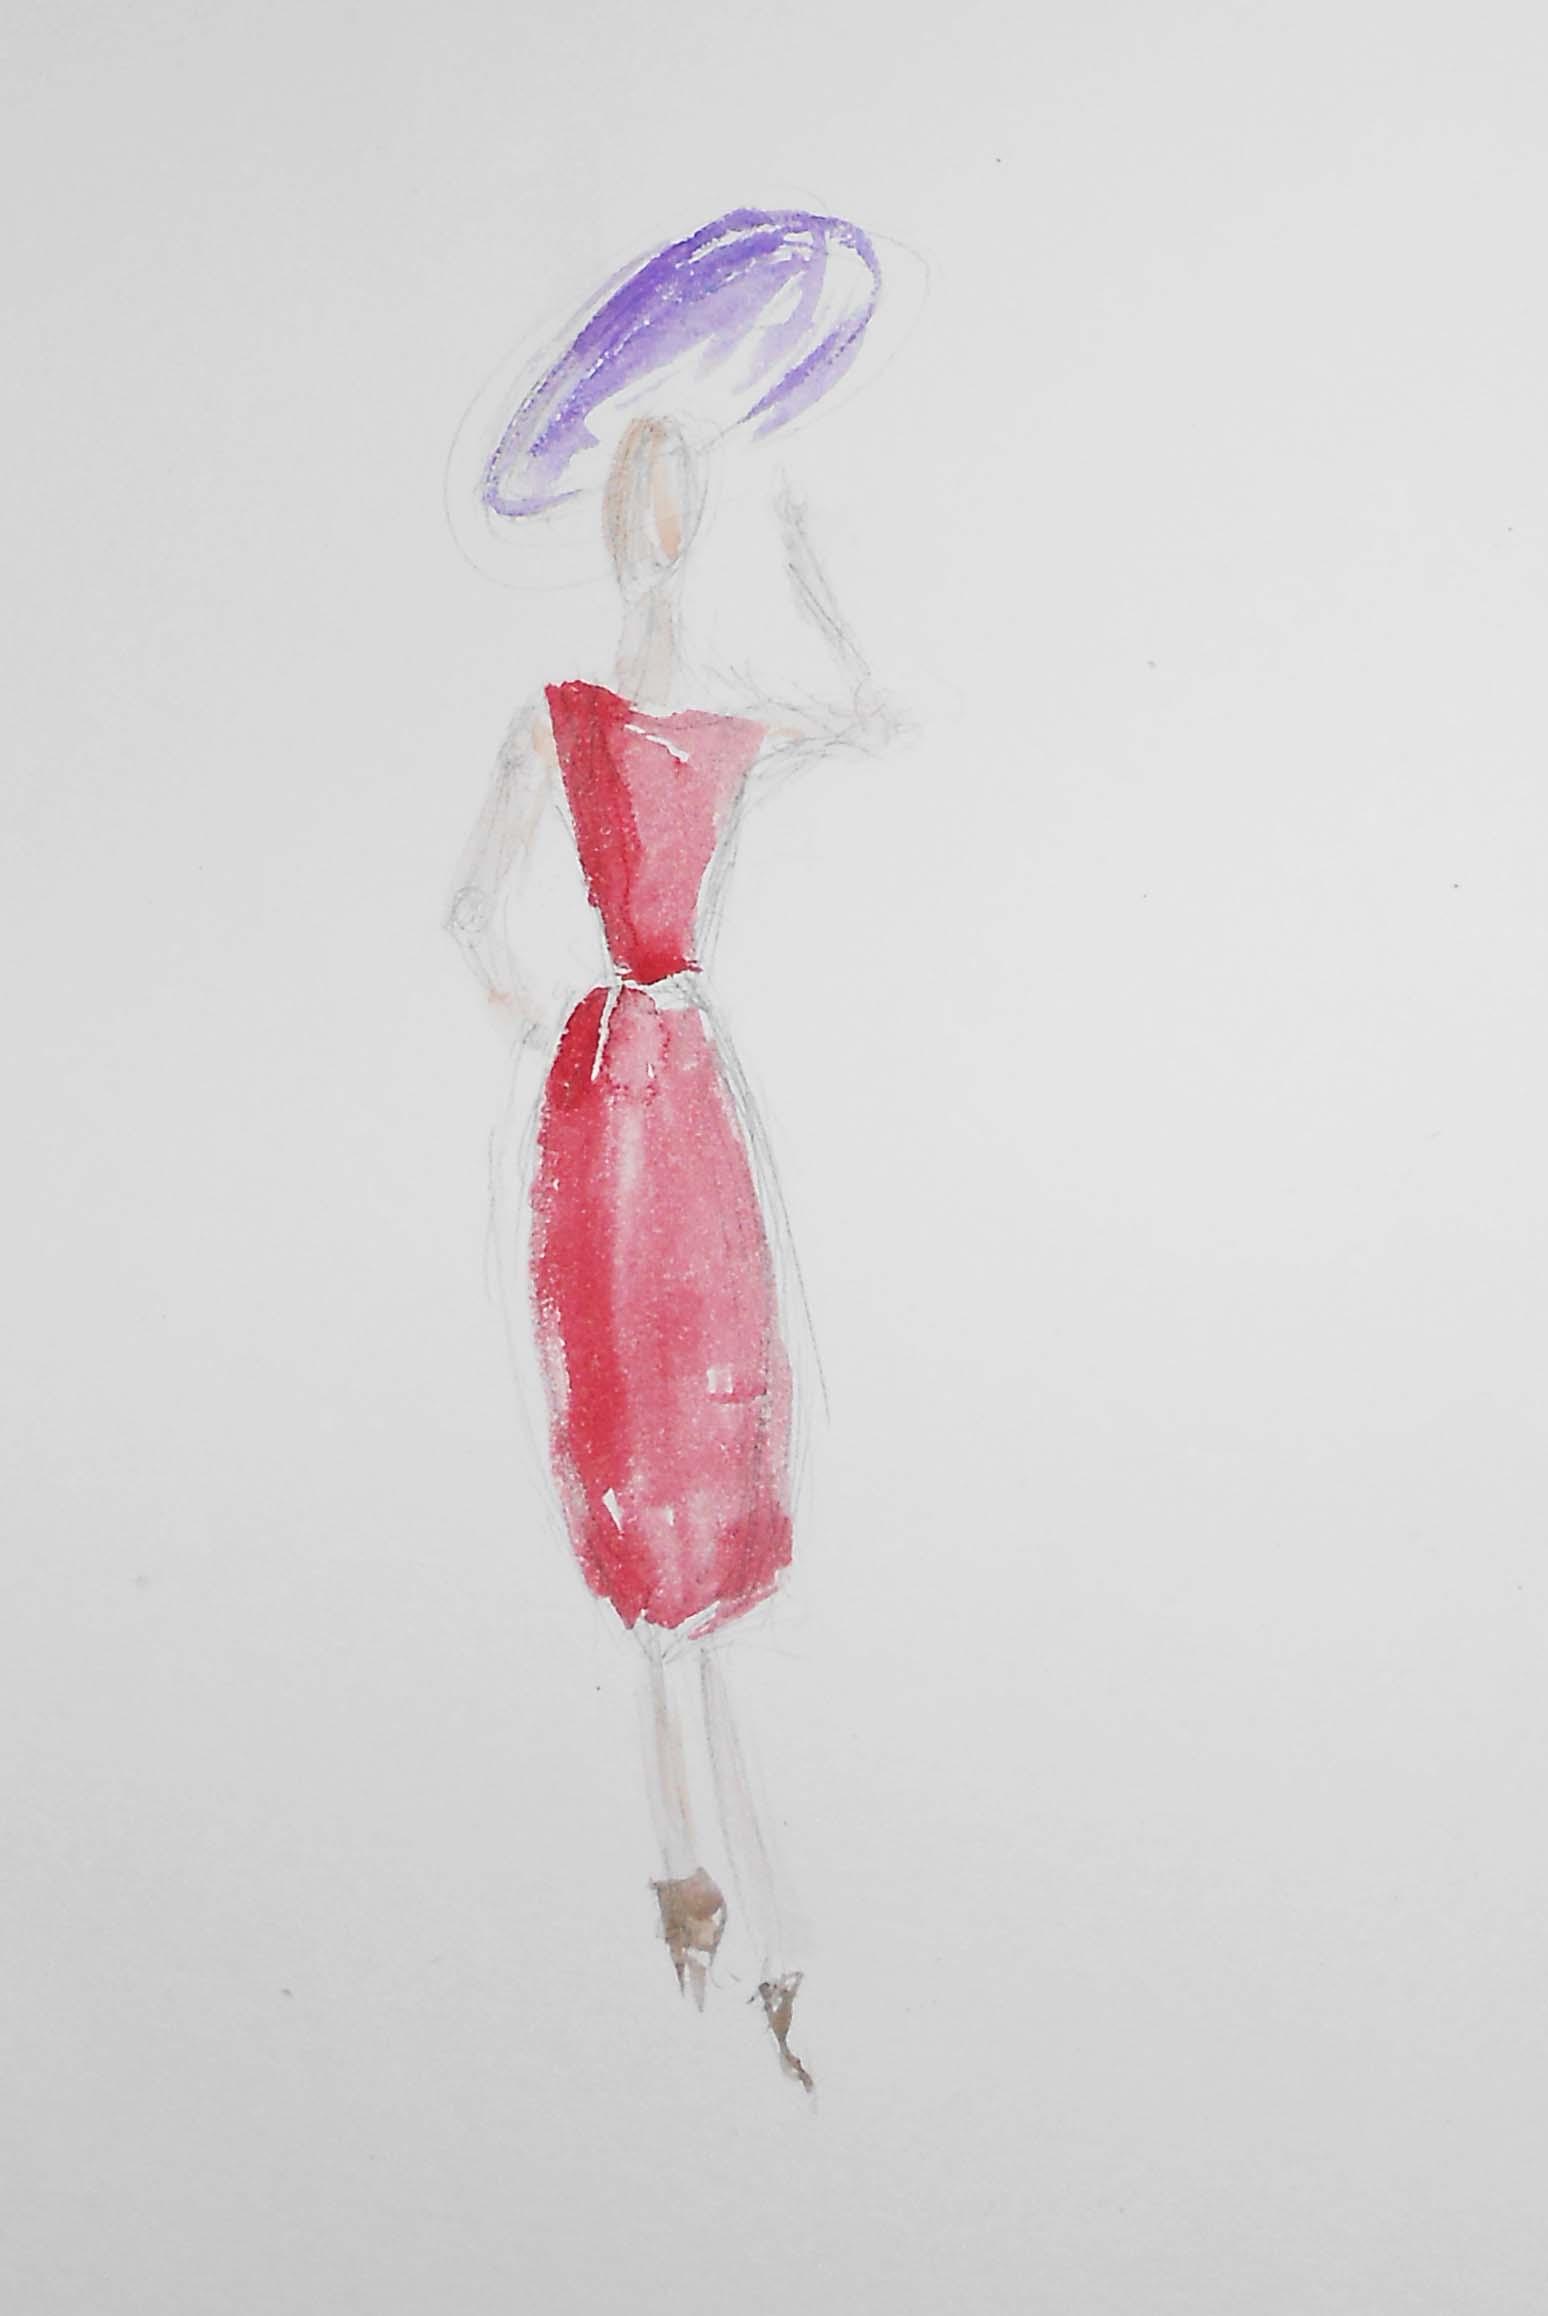 Watercolour - Silhouette & Sparkle! - image 1 - student project